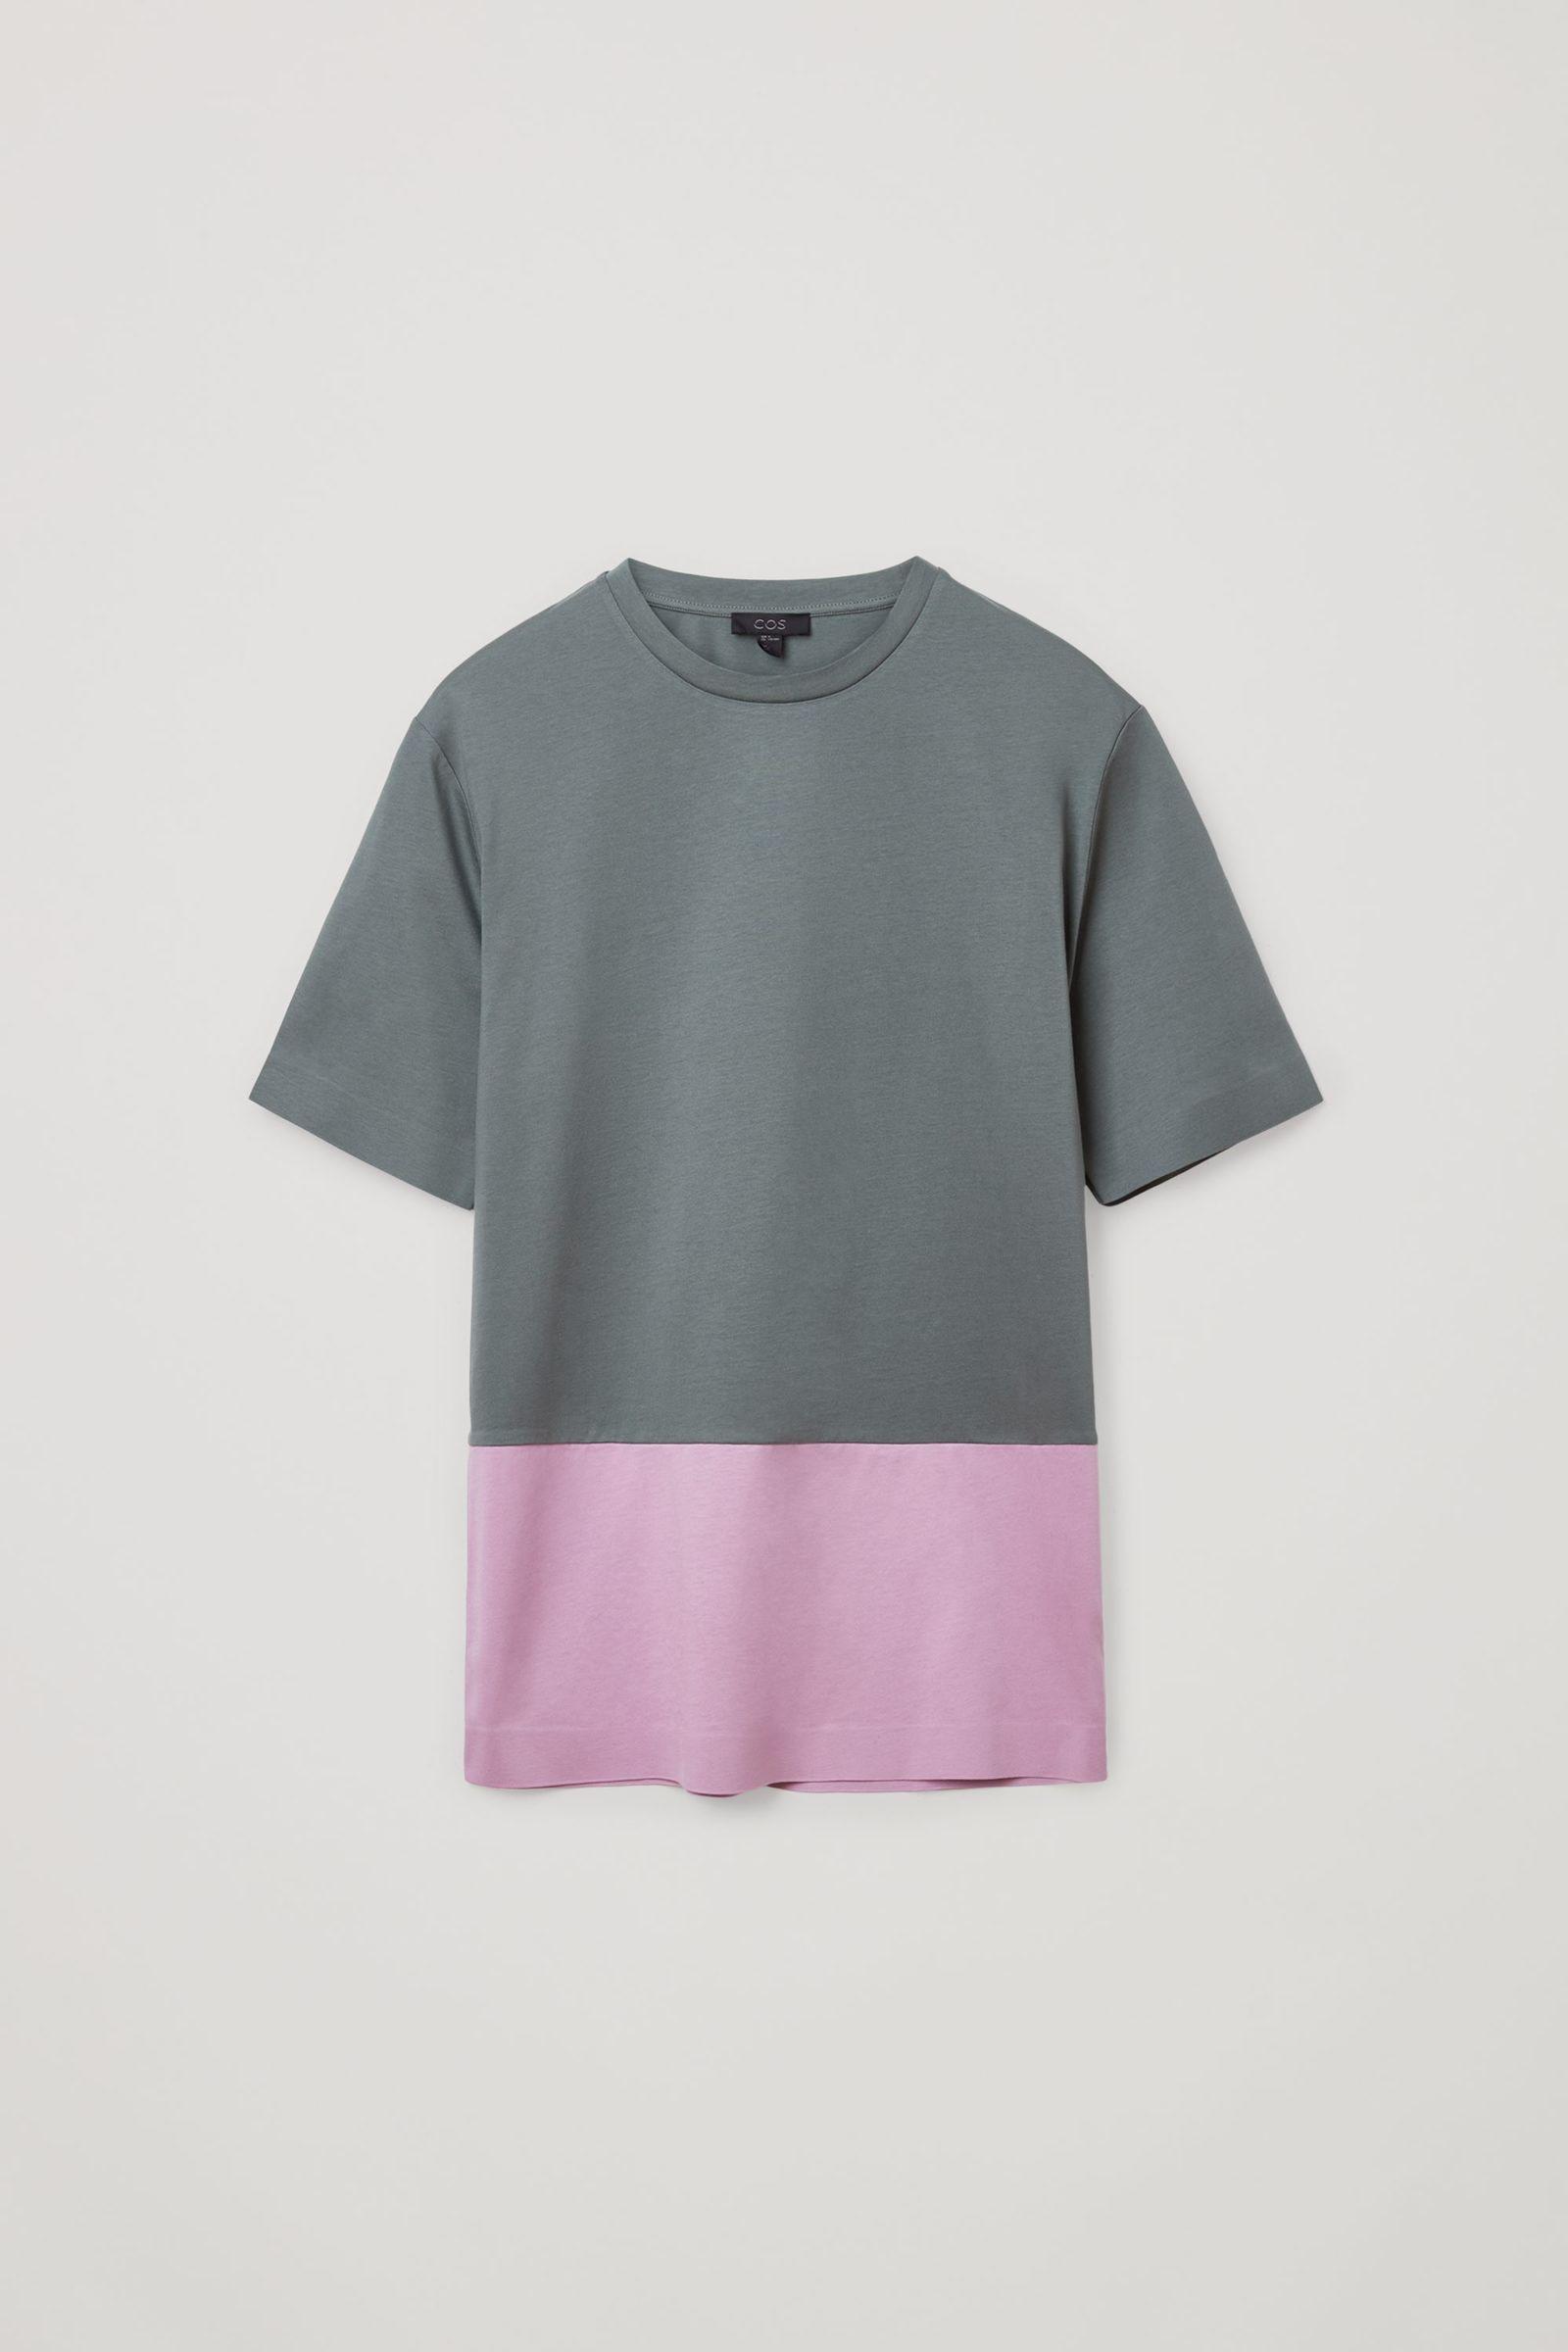 COS 본디드 코튼 티셔츠의 그레이 / 핑크컬러 Product입니다.